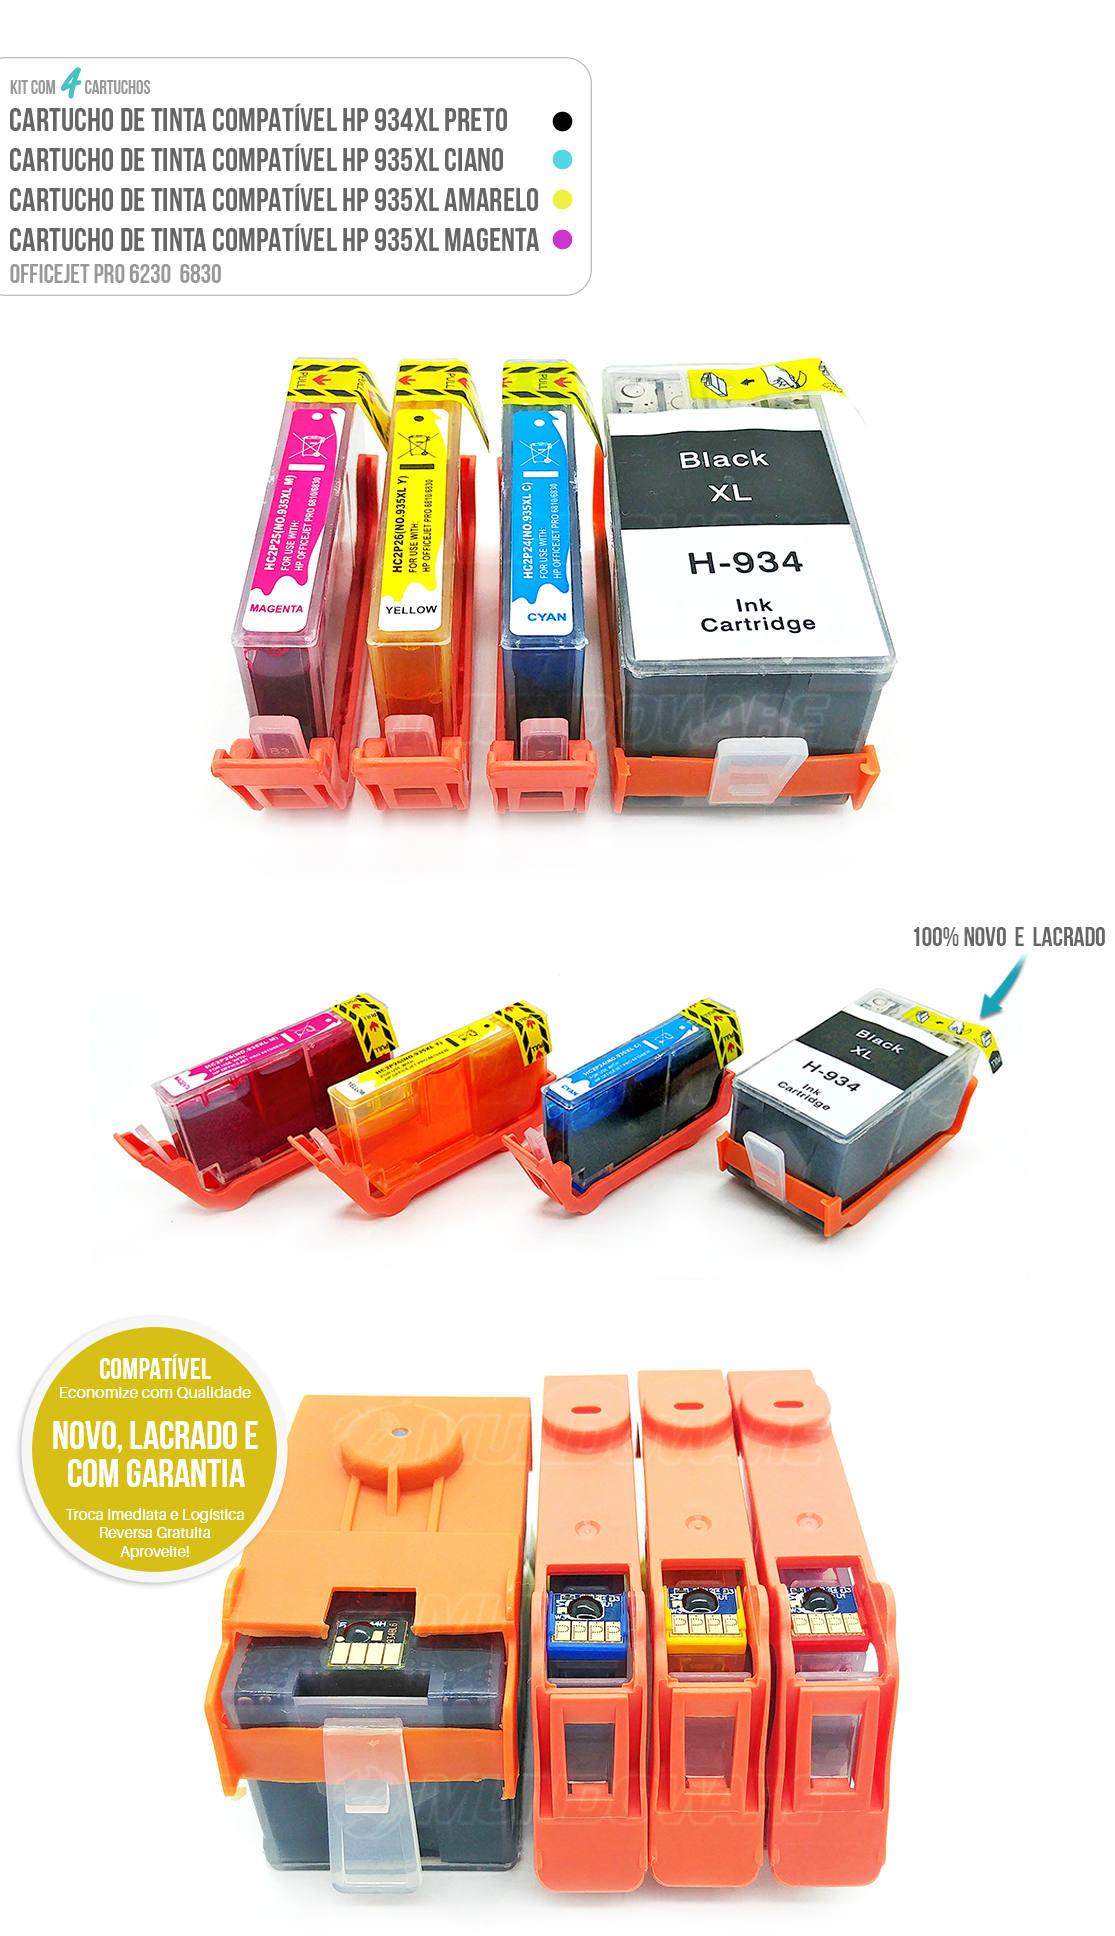 Kit Colorido de Cartucho de Tinta compatível 935xl 934xl para impressora 6230 6830